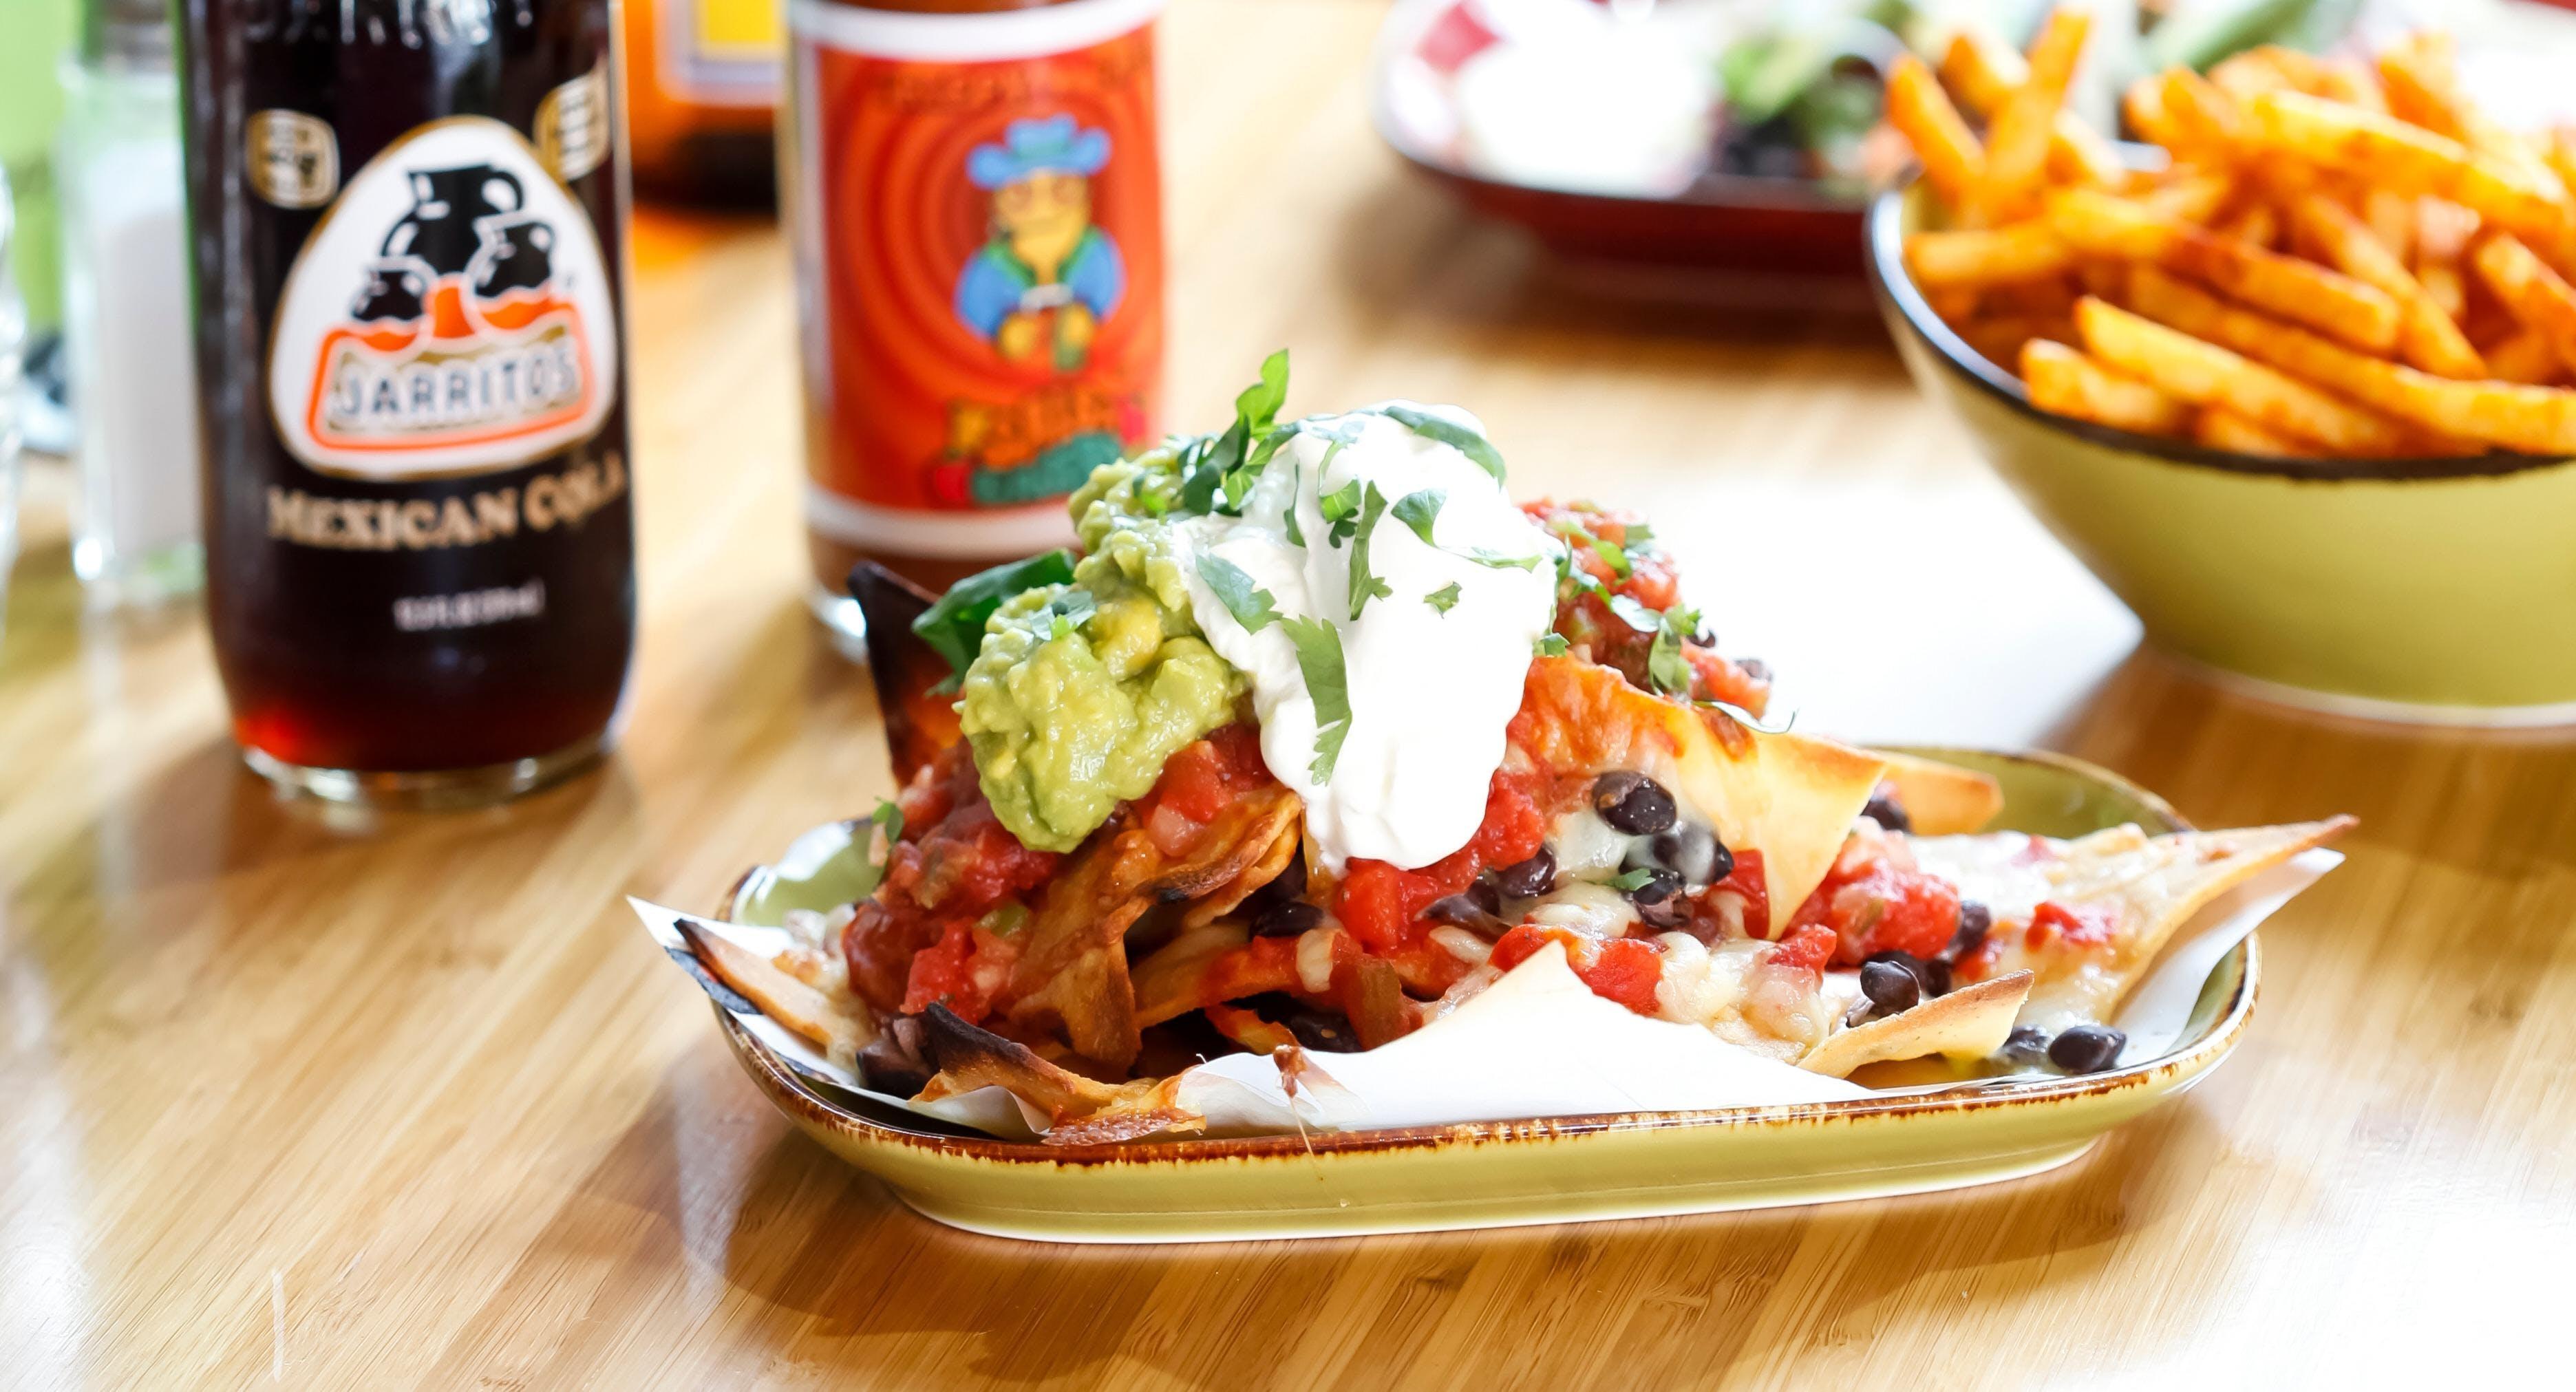 Trippy Taco - Southside Melbourne image 1